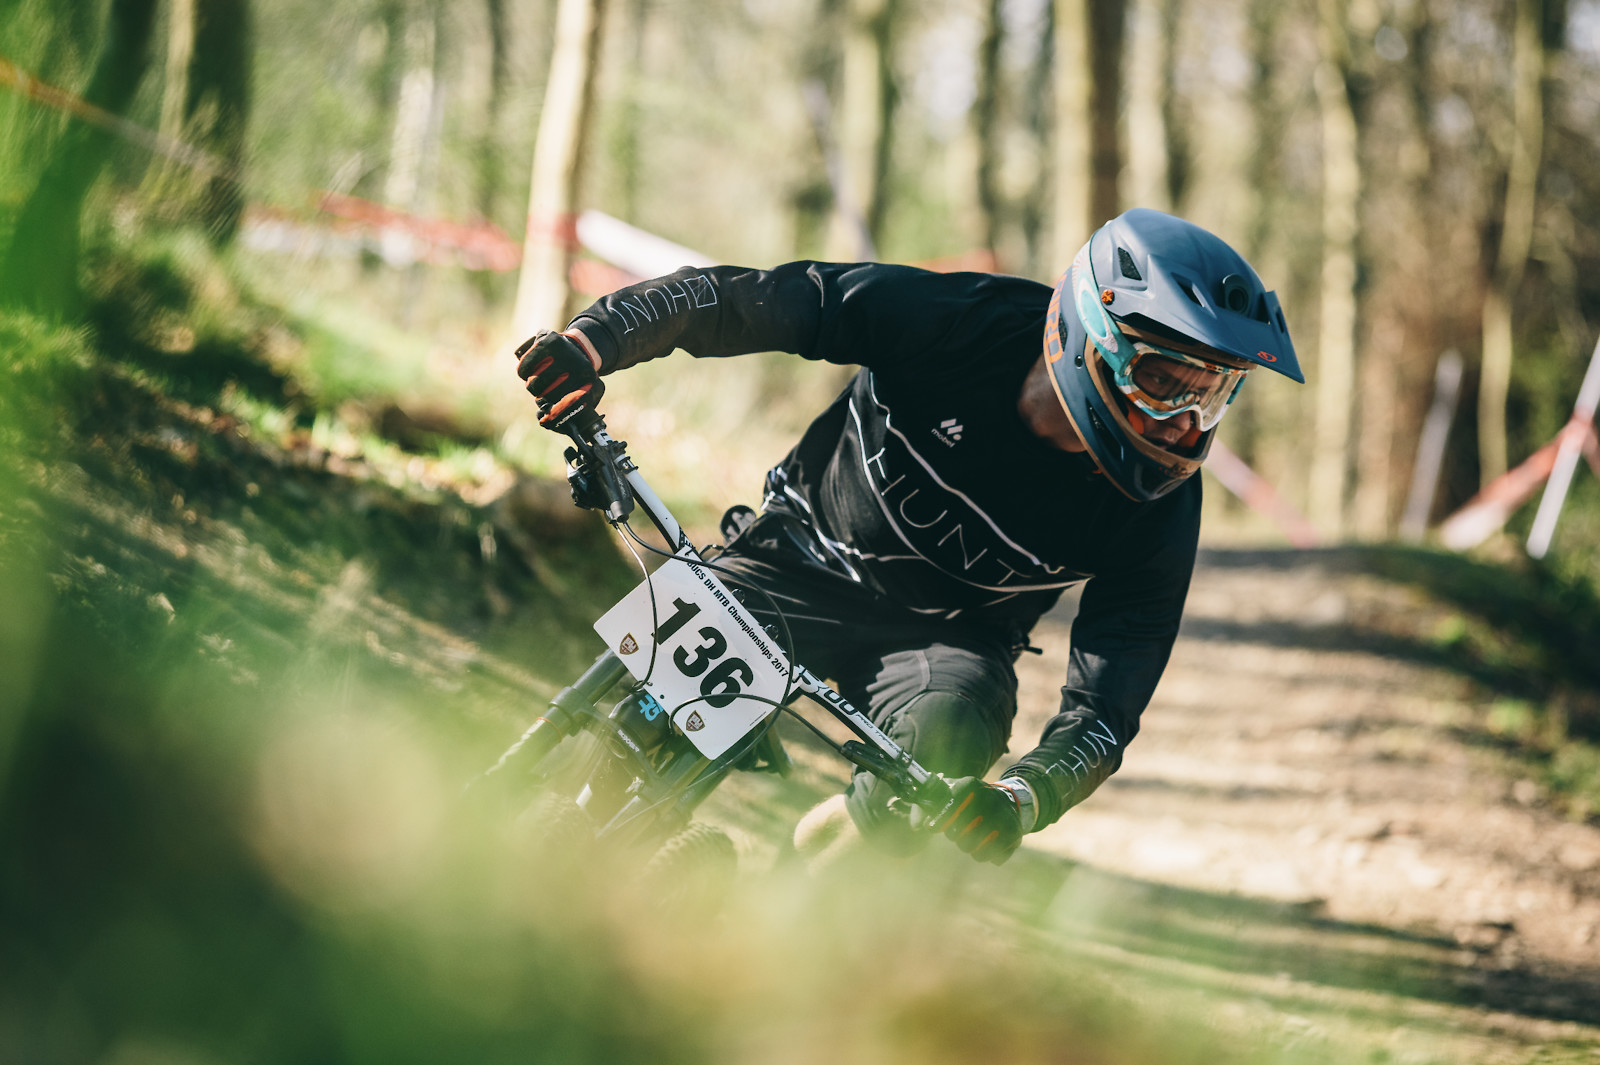 HUNT Bike Wheels Rider Dan - DomKniight100 - Mountain Biking Pictures - Vital MTB